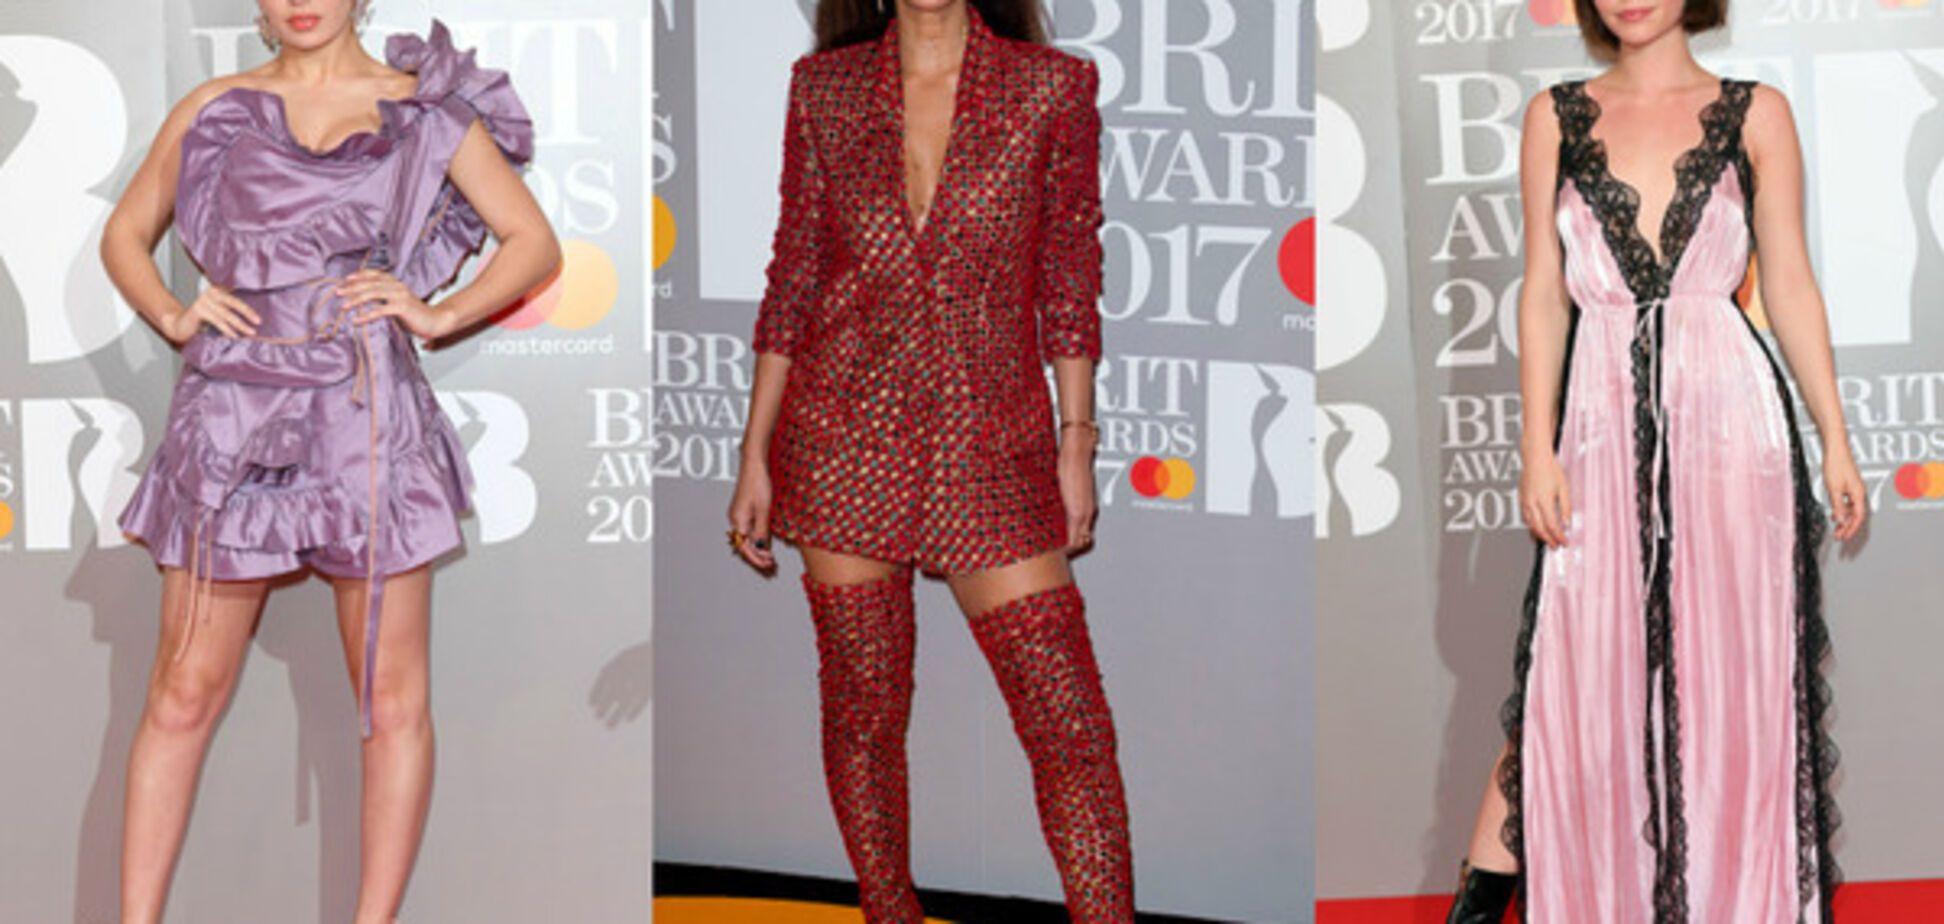 Brit Awards-2017